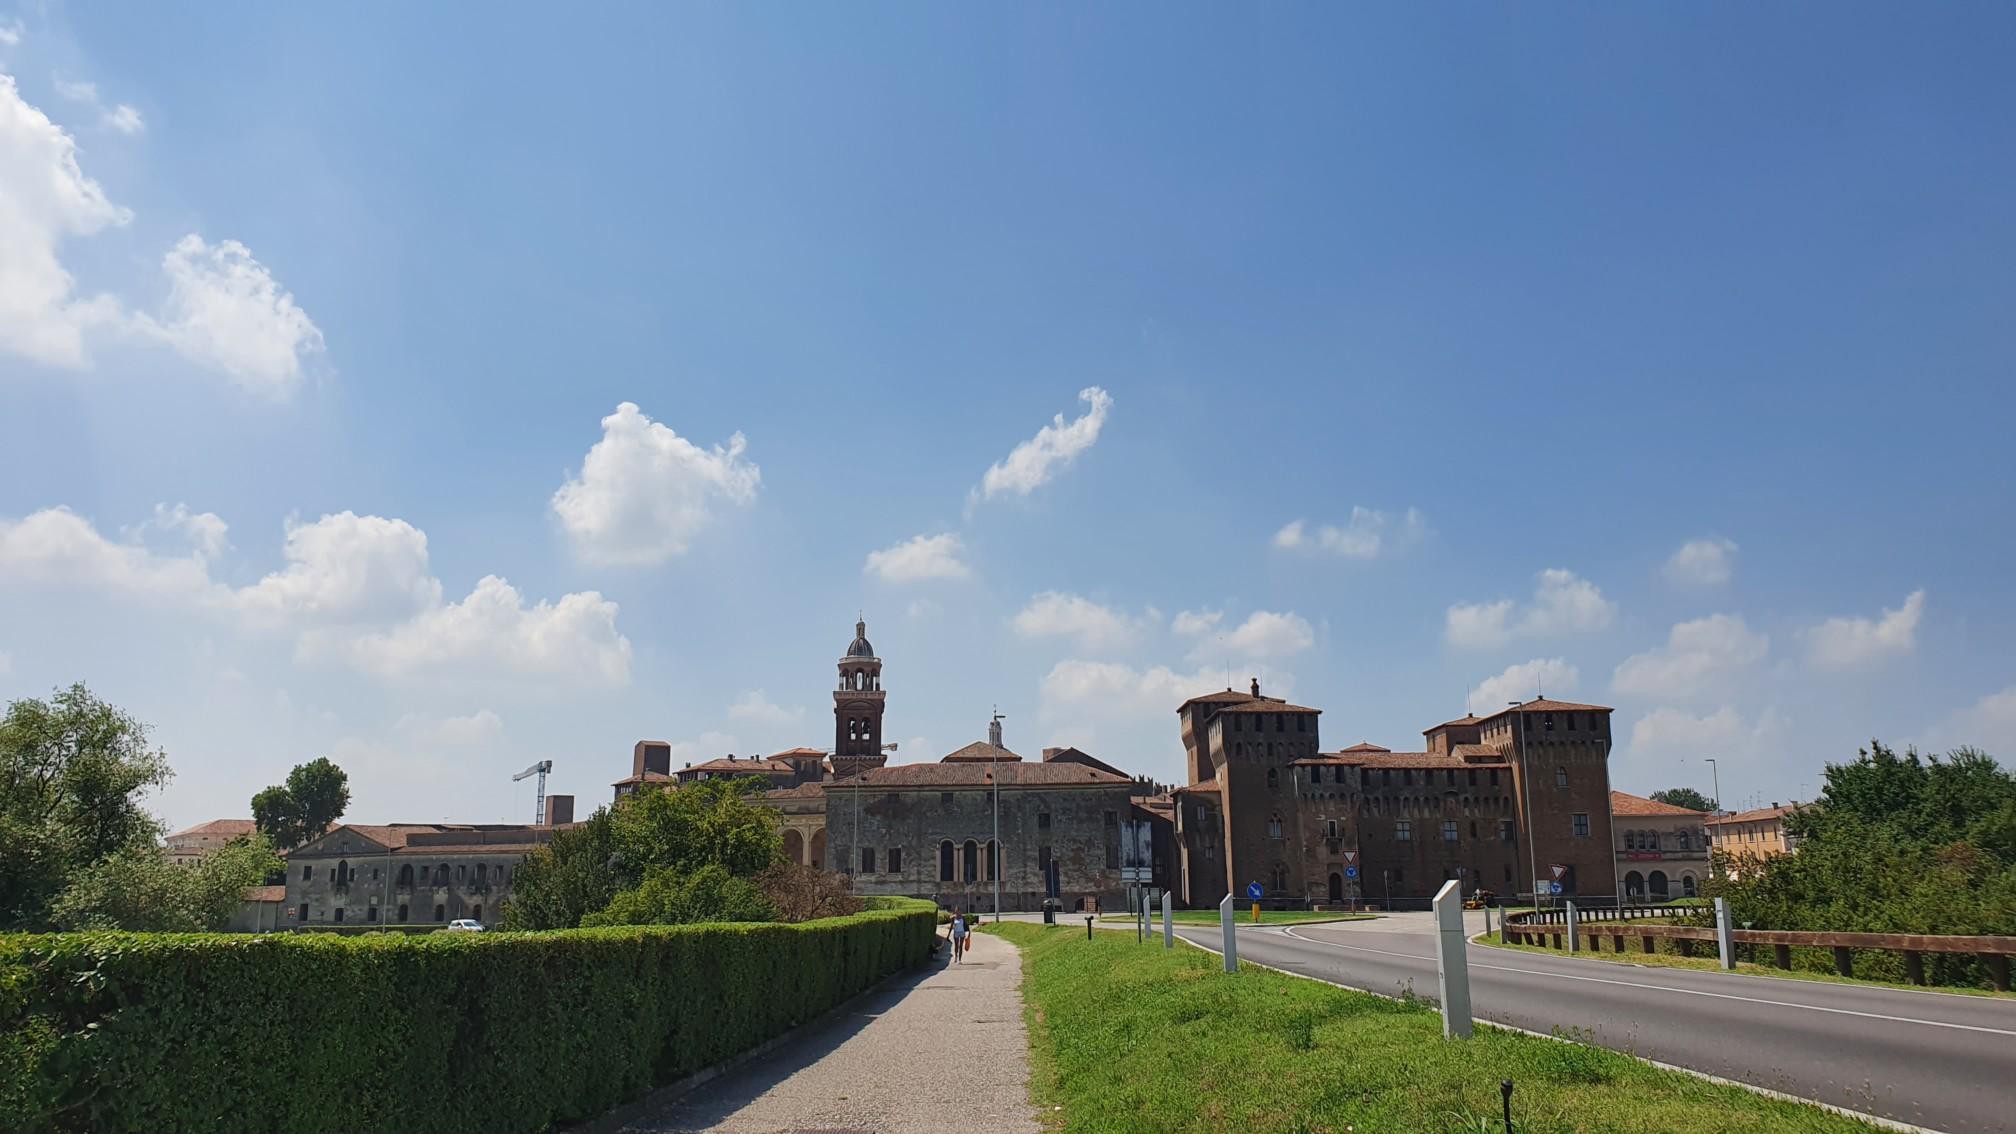 Palazzo Ducale in Mantua